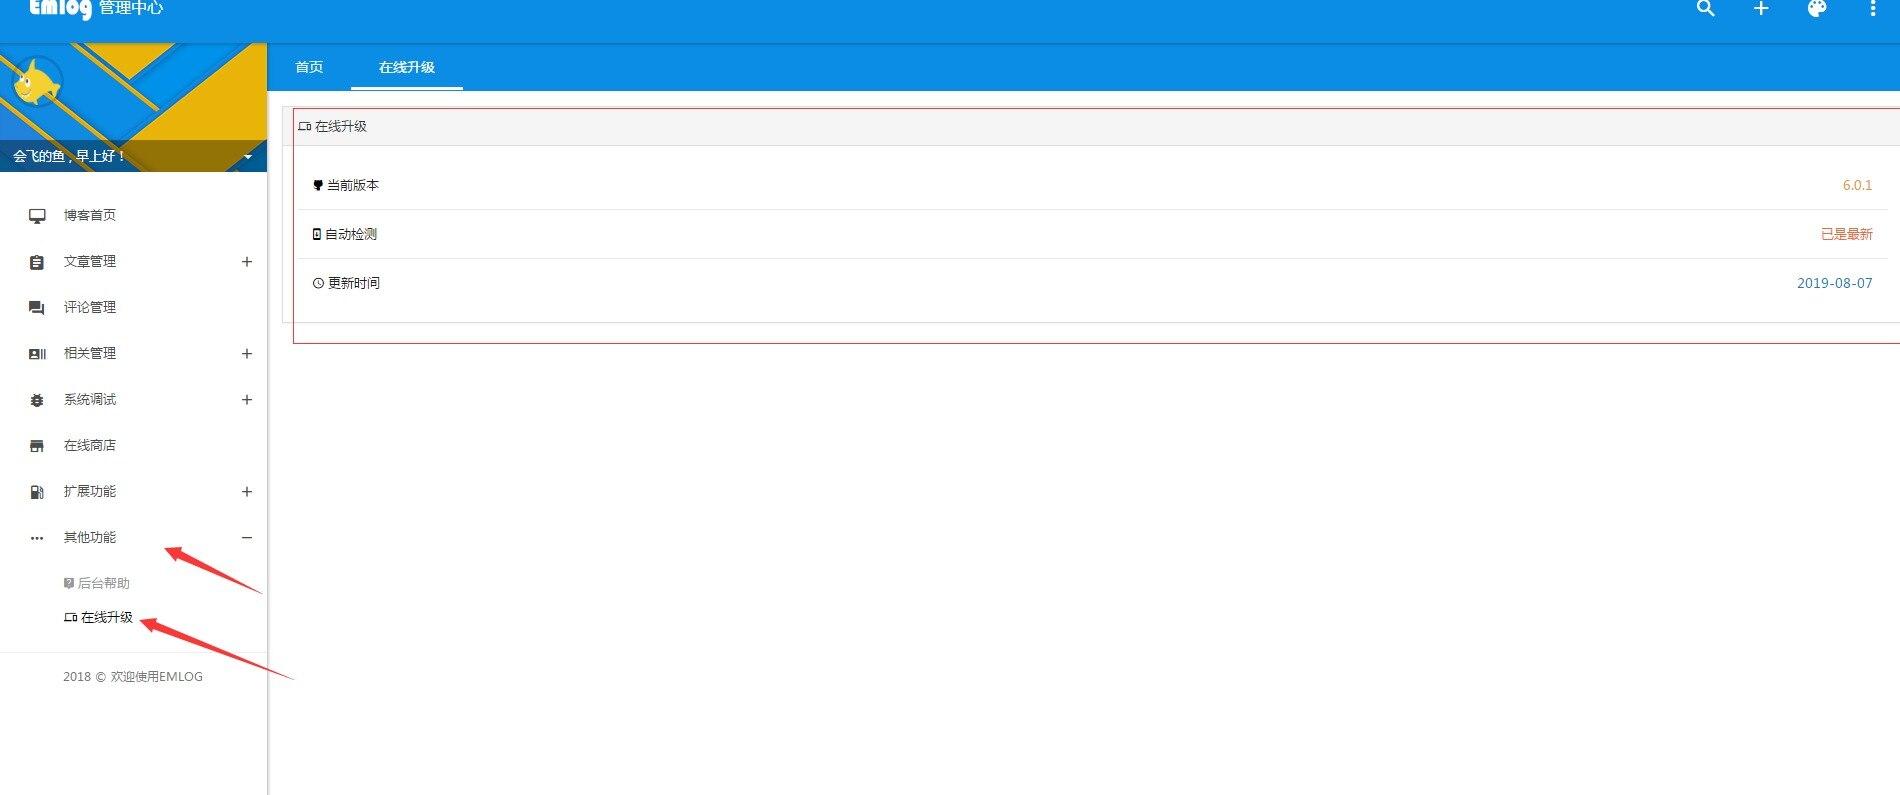 emlog6.0.1在线商店修复